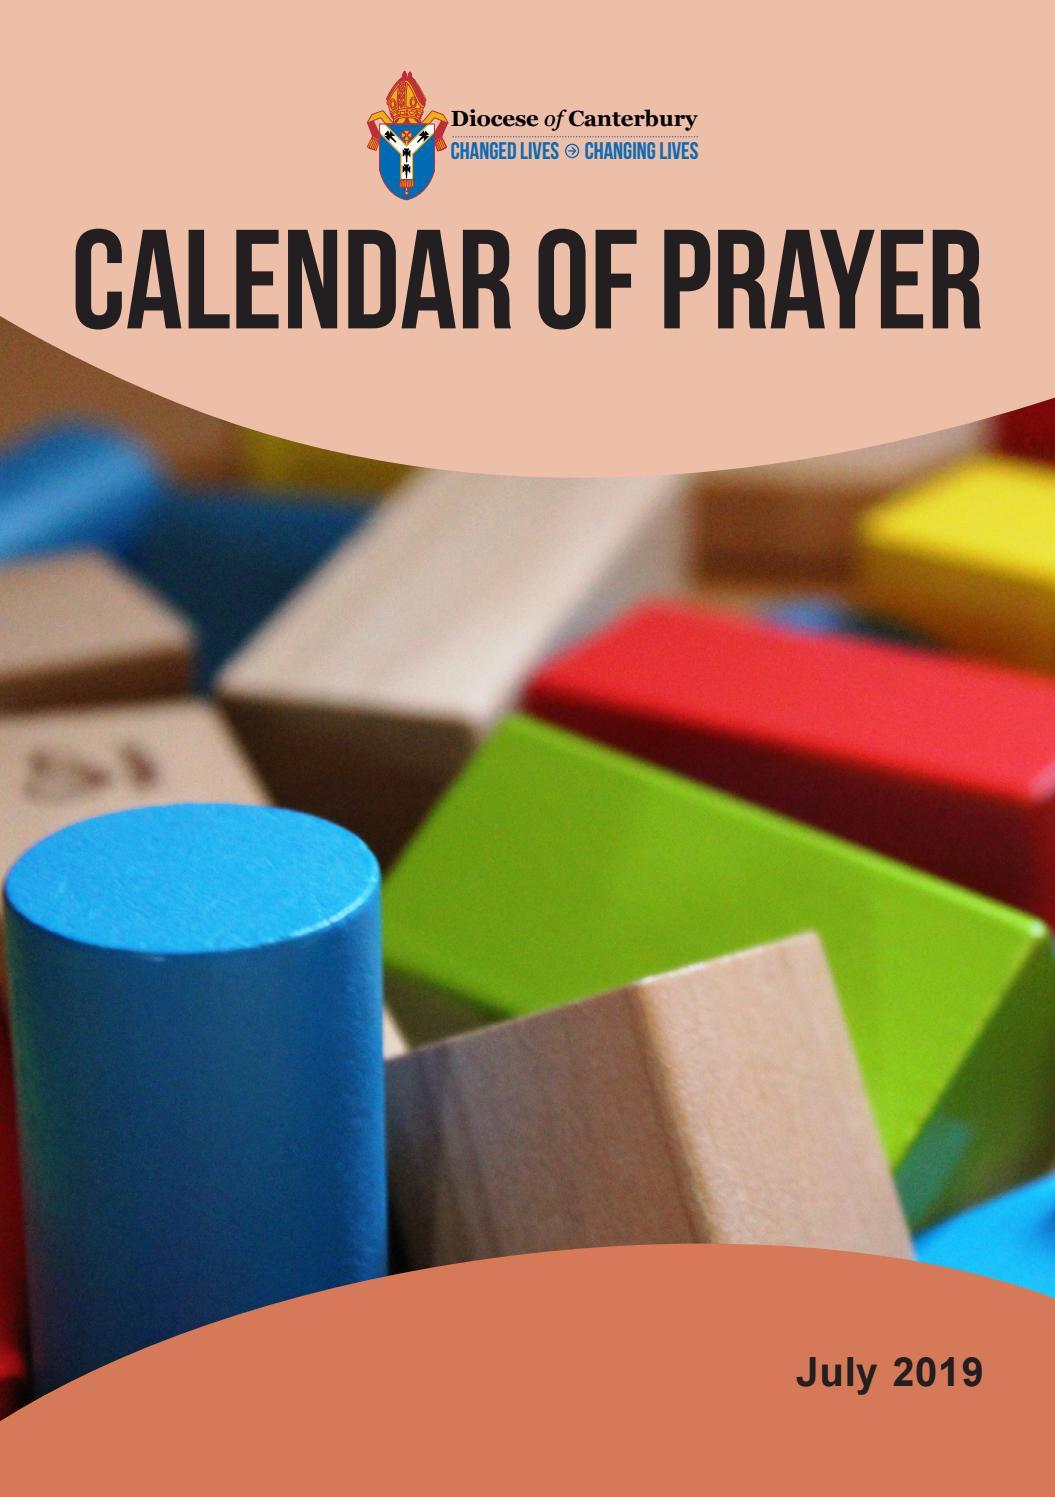 Calendar Of Prayer  July 2019 By The Diocese Of Canterbury inside Roger Rowe School Calendar